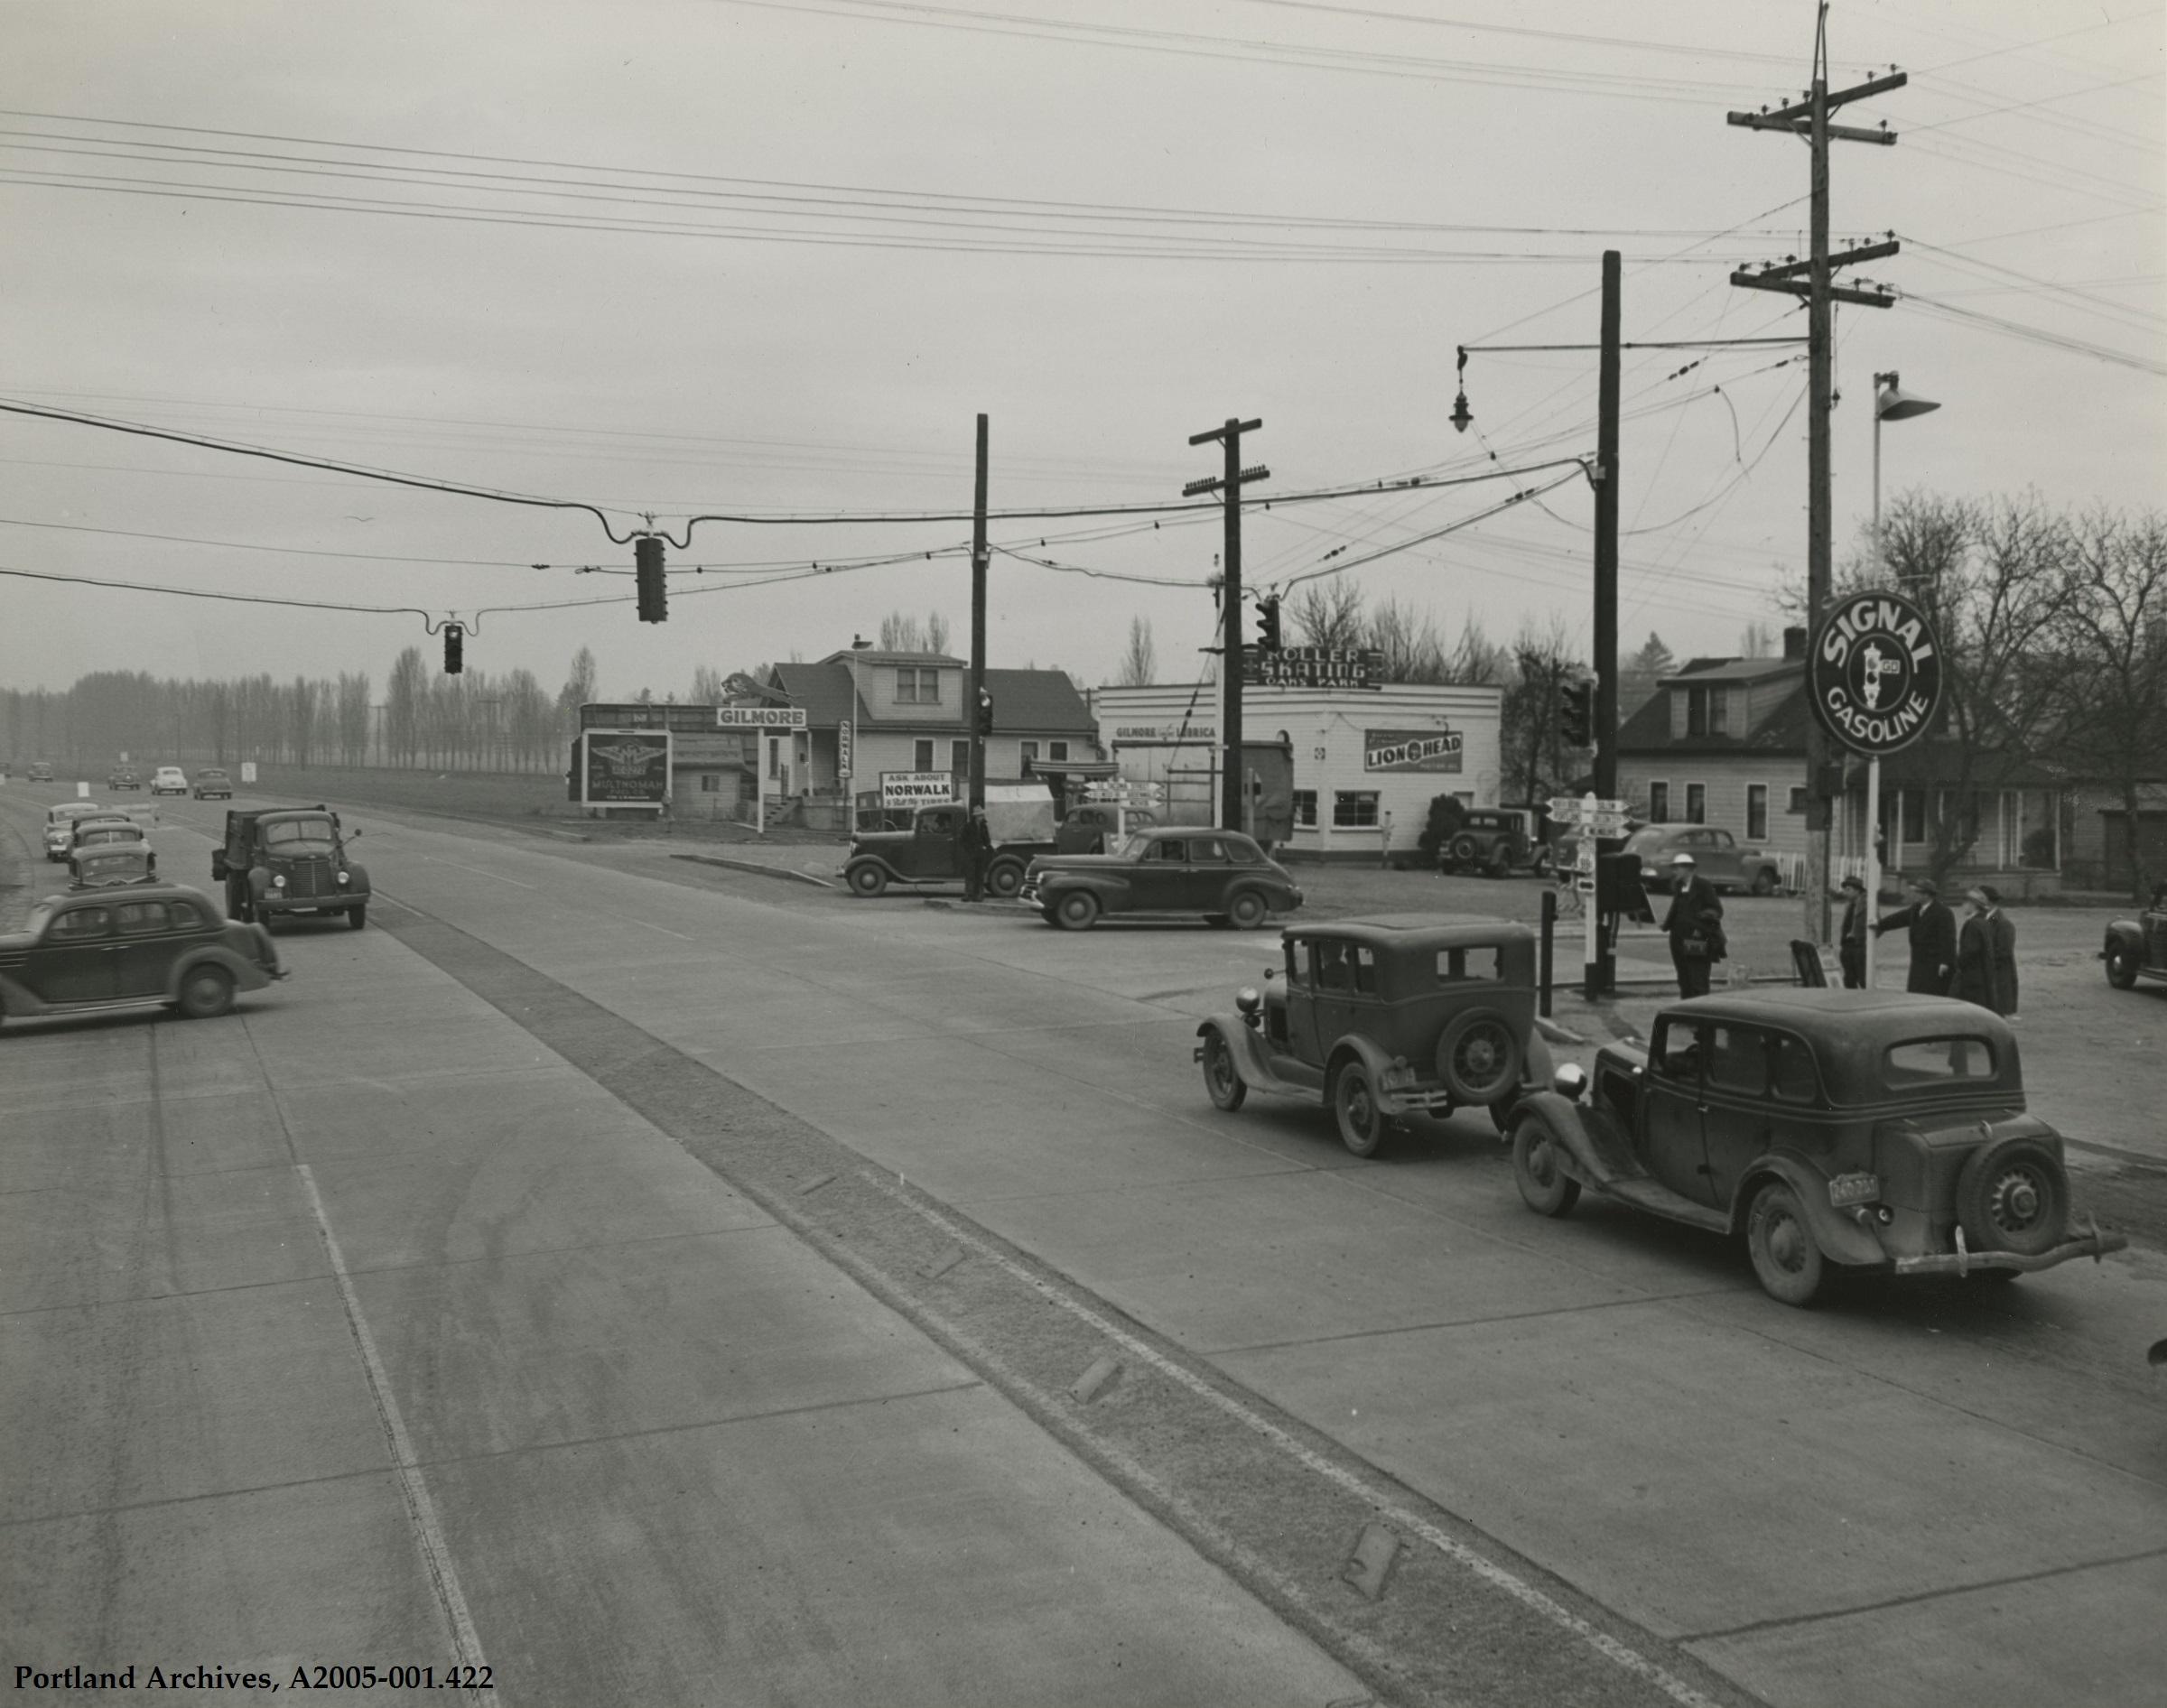 SE McLoughlin Boulevard and SE Tacoma Street looking north, circa 1942: A2005-001.422